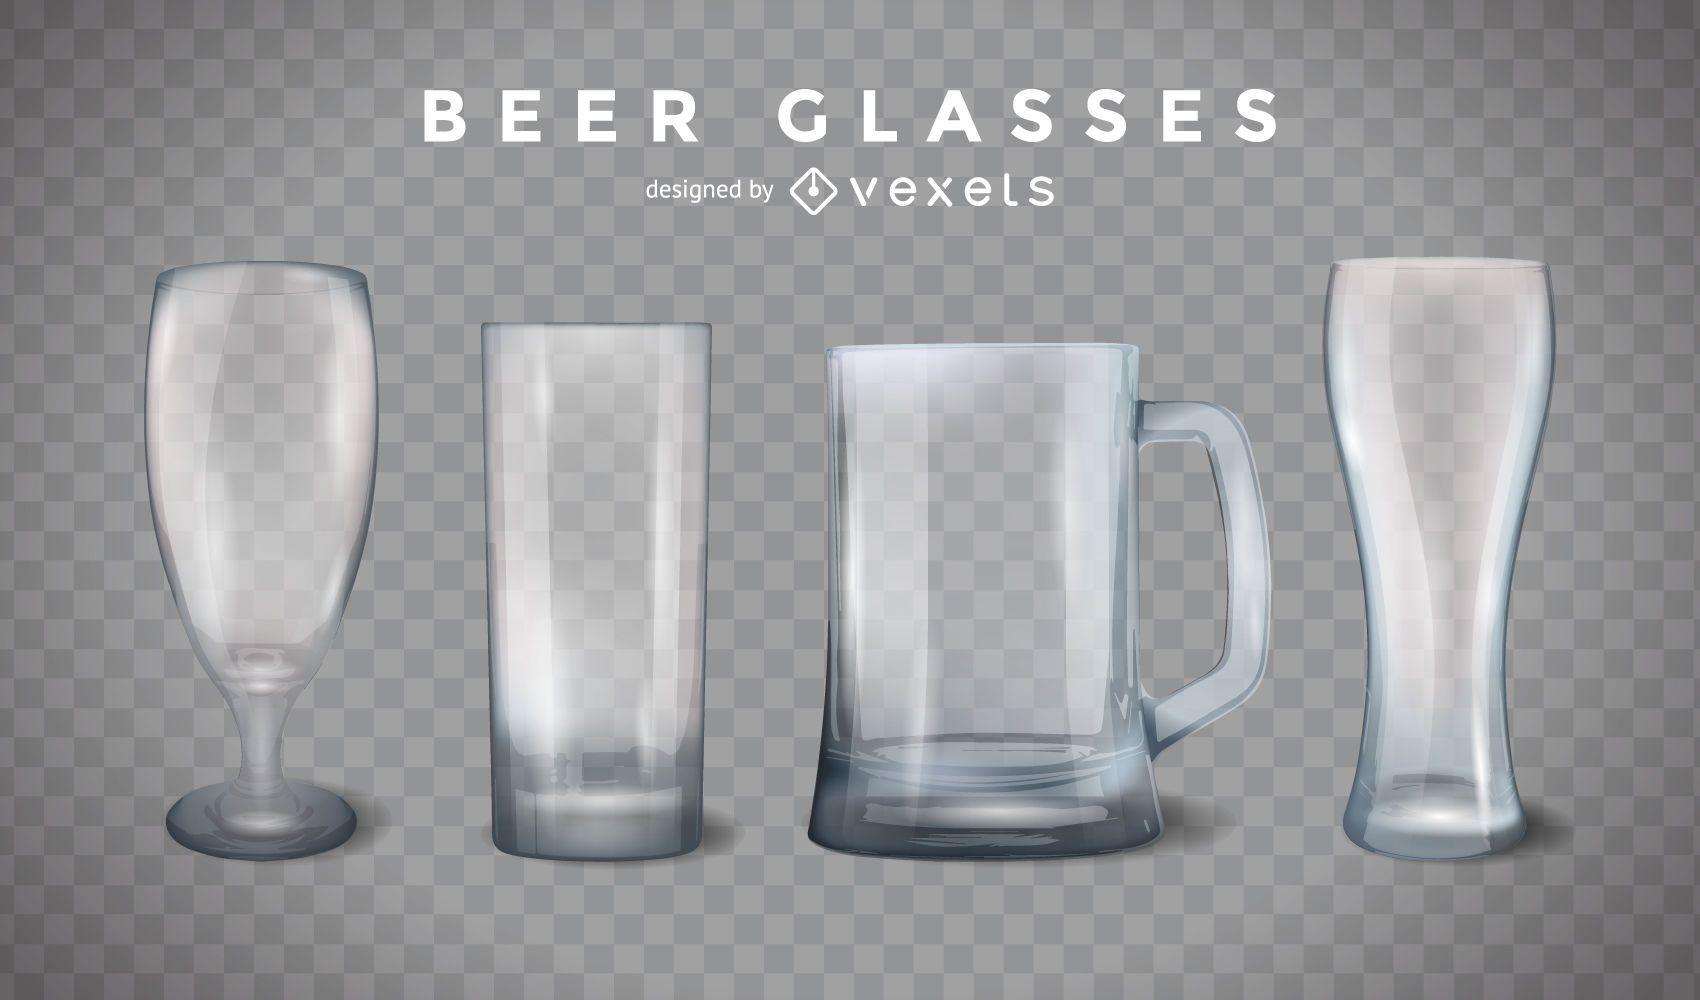 Beer glasses and mugs set